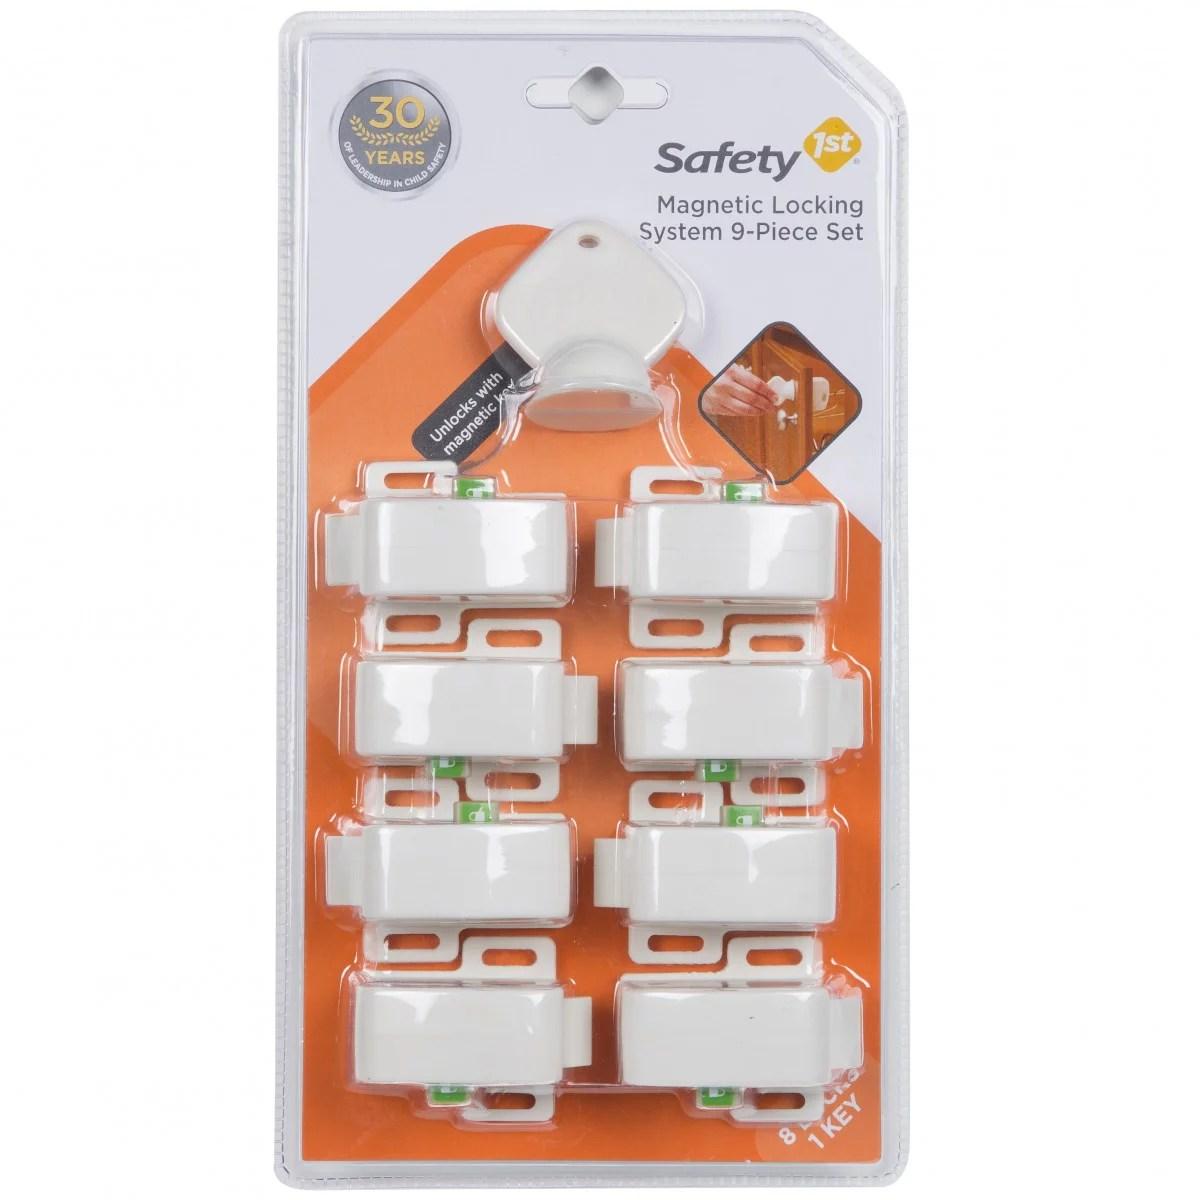 Safety 1st Complete Magnetic Locking System 8 Locks